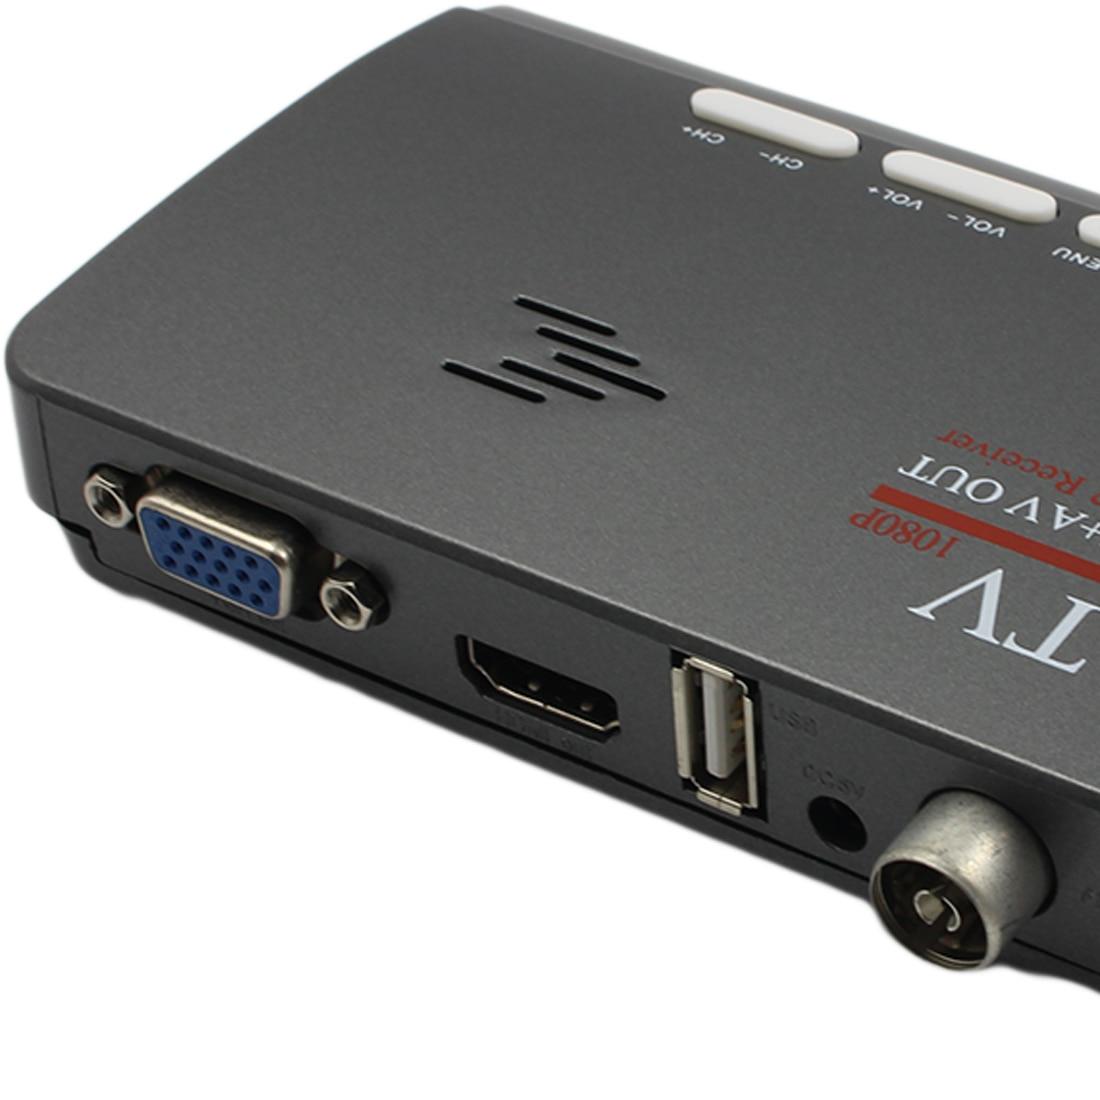 Reveiver Marsnaska DVB-T DVB-T2 Digitale Terrestre HDMI 1080 P DVB-T/T2 VGA CVBS AV Ricevente del Sintonizzatore TV Con Telecomando controllo